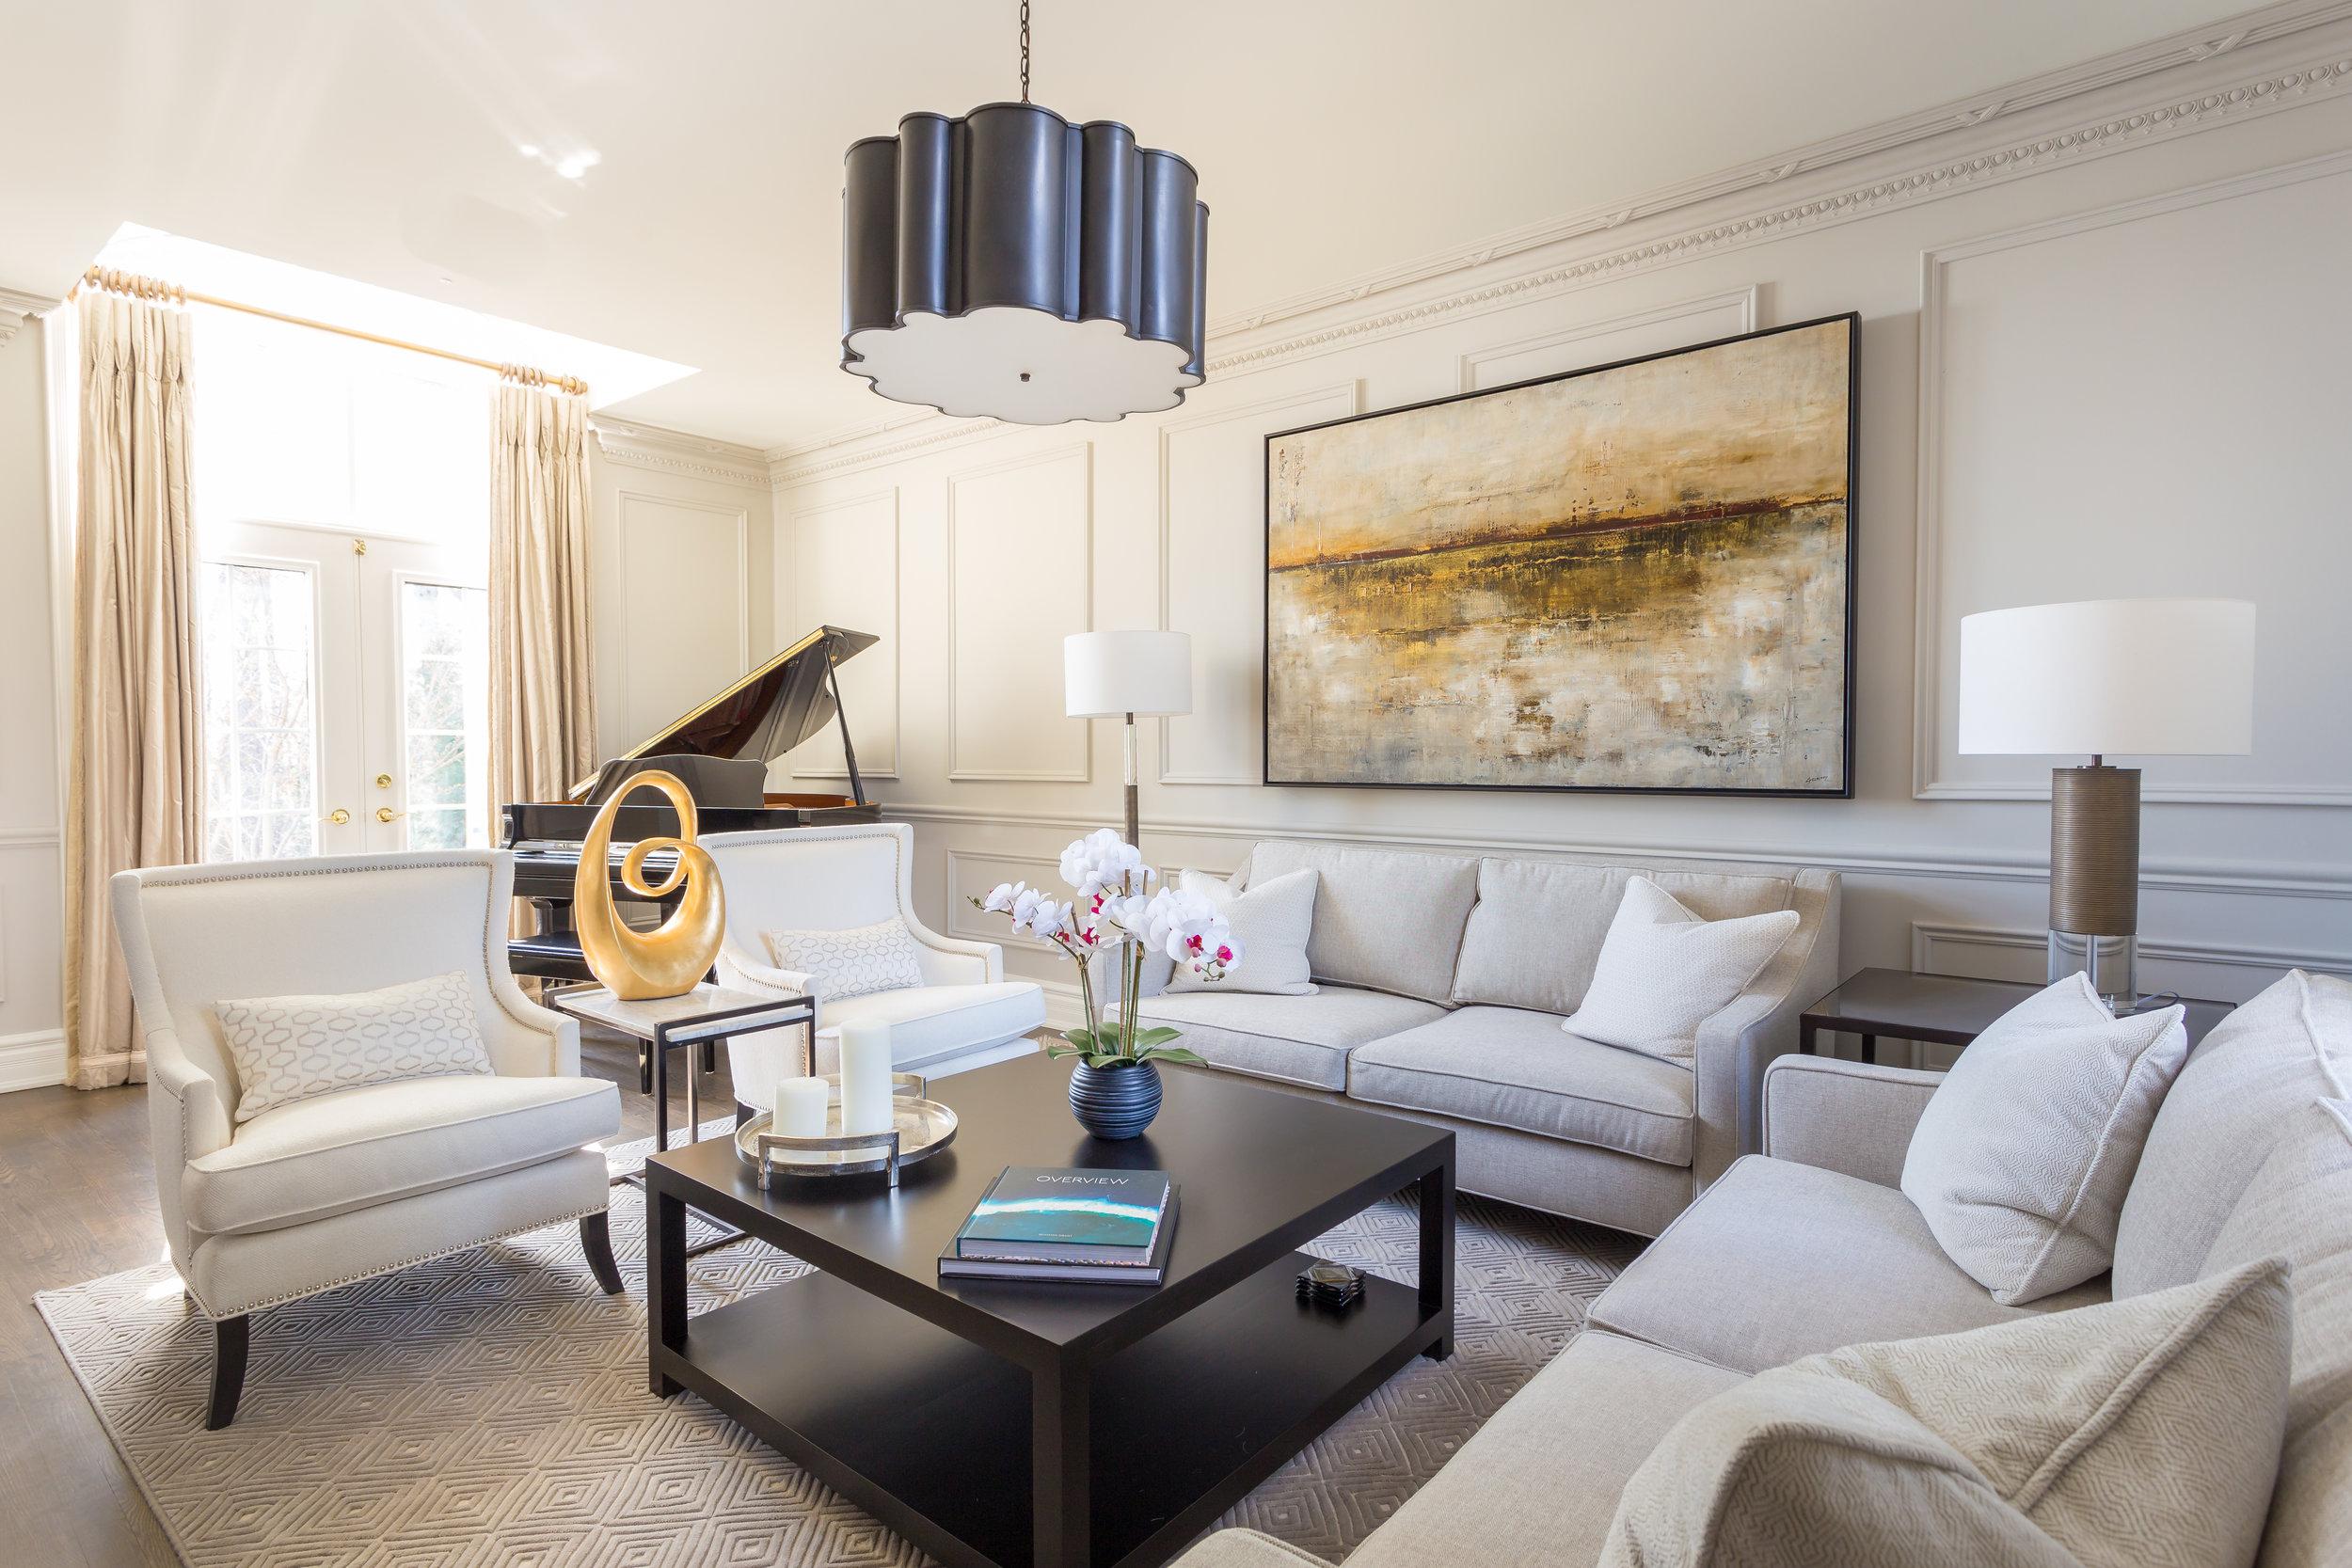 oakville-interior design-living room-robson hallford